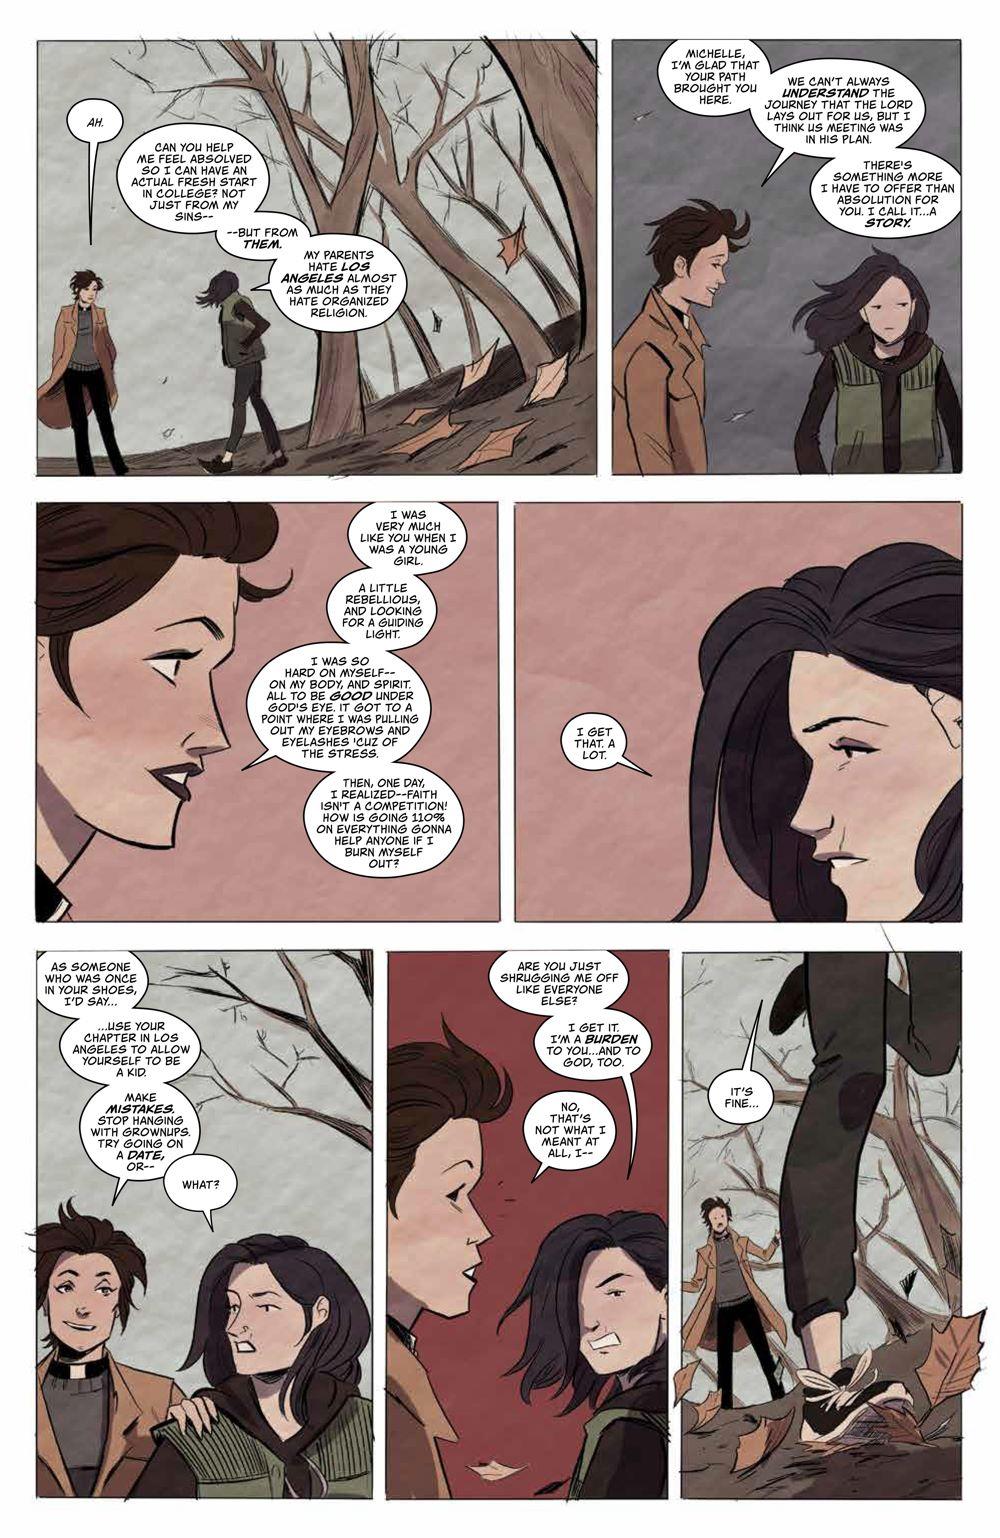 GhostedInLA_v3_SC_PRESS_11 ComicList Previews: GHOSTED IN L.A. VOLUME 3 TP